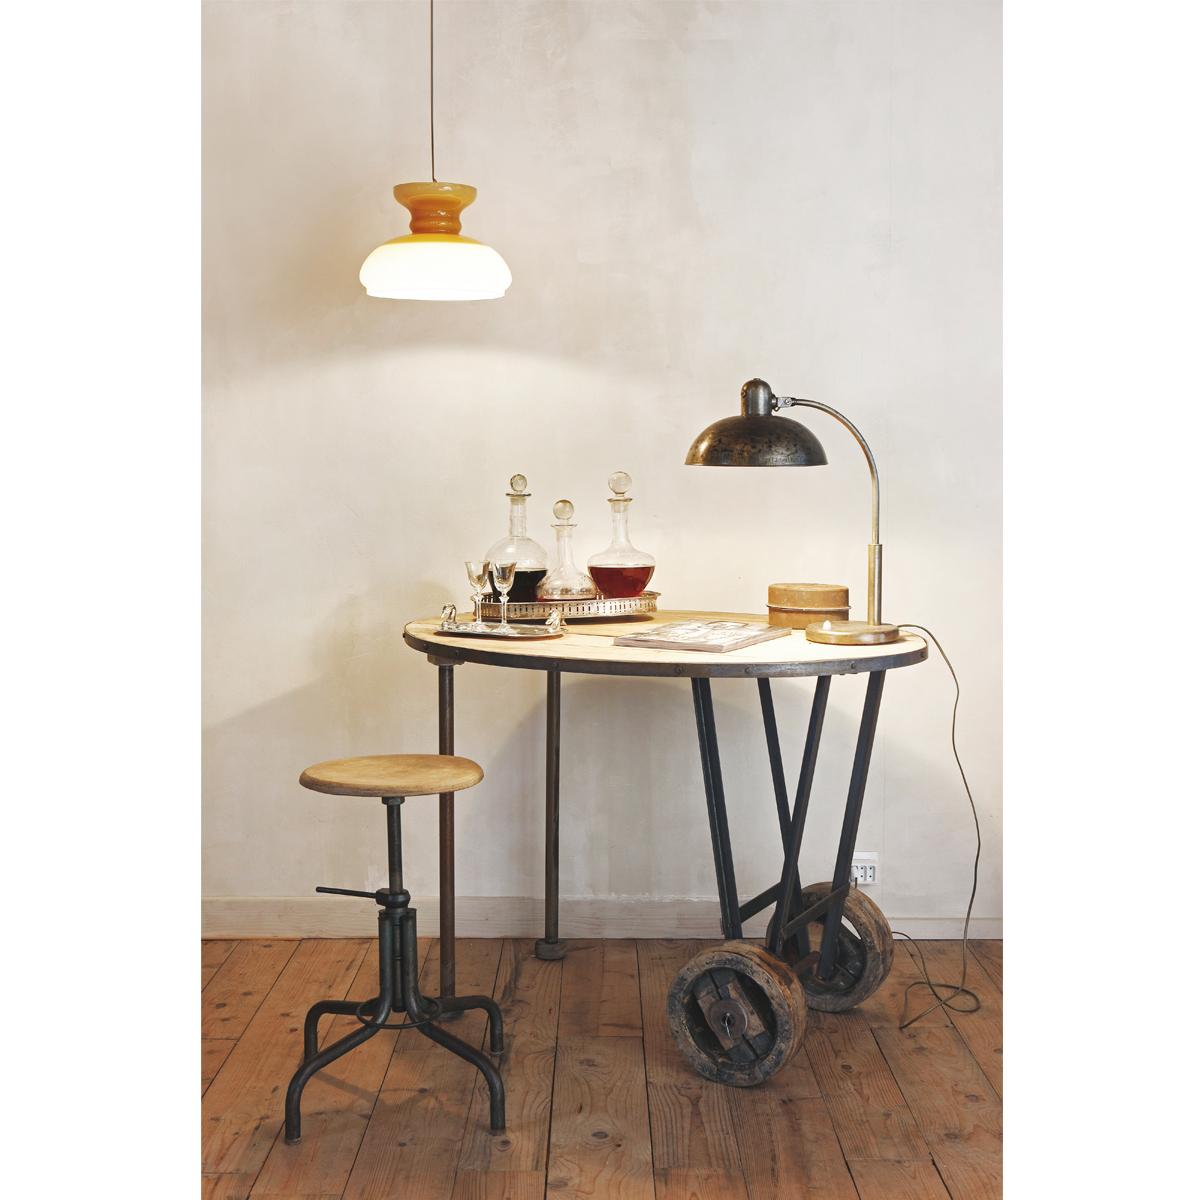 Grote Side Table.Ovale Bijzettafel Met Grote Industriele Wielen Oval Side Table With Large Industrial Wheels